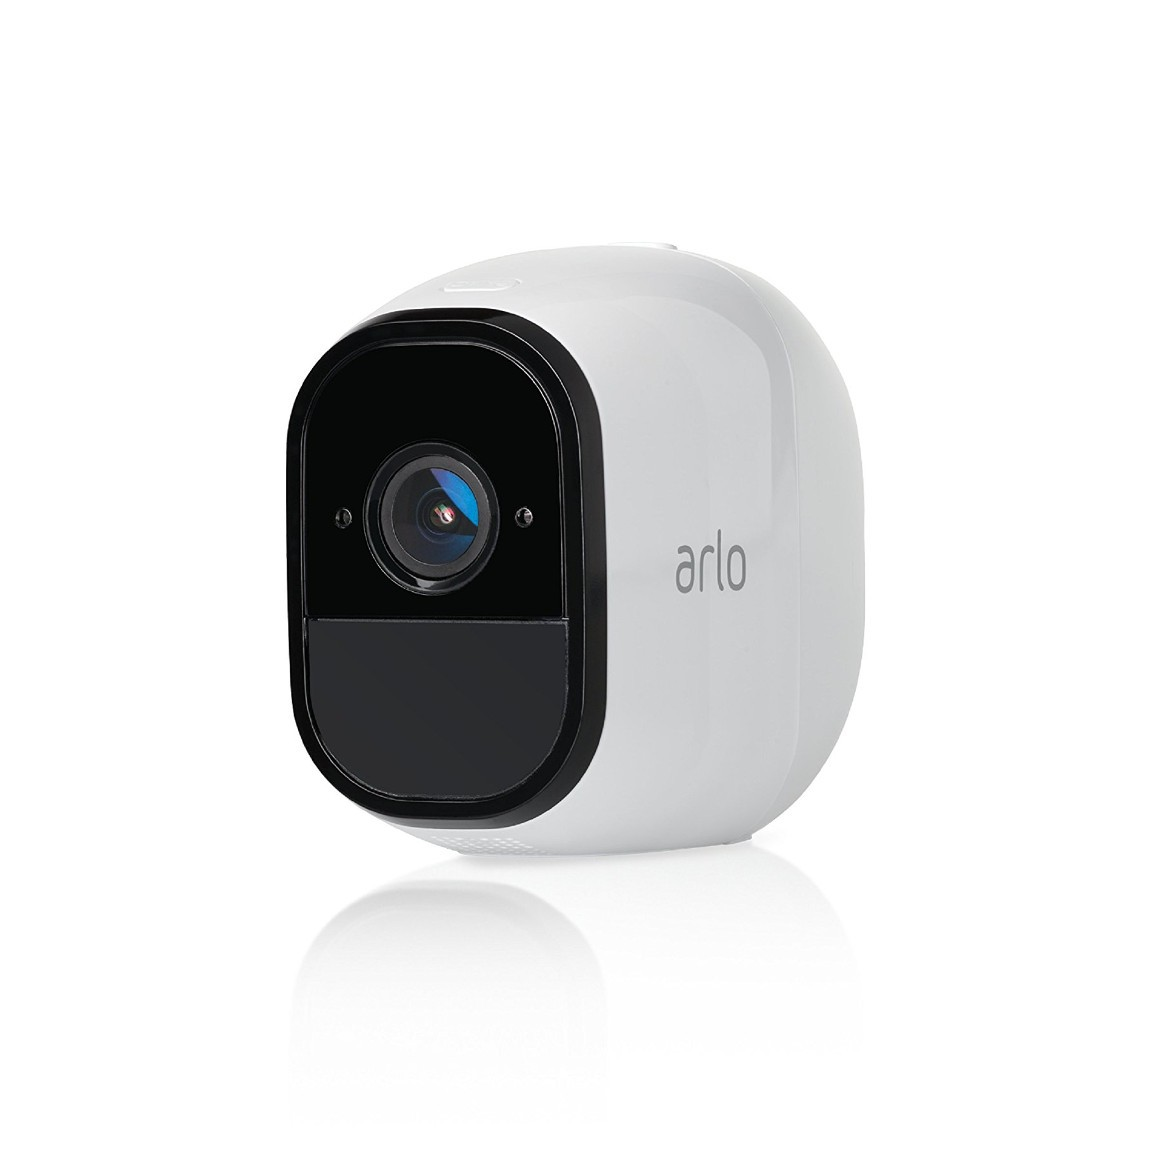 Netgear Arlo Pro - Add-on-Sicherheitskamera (VMC4030) - Weiß